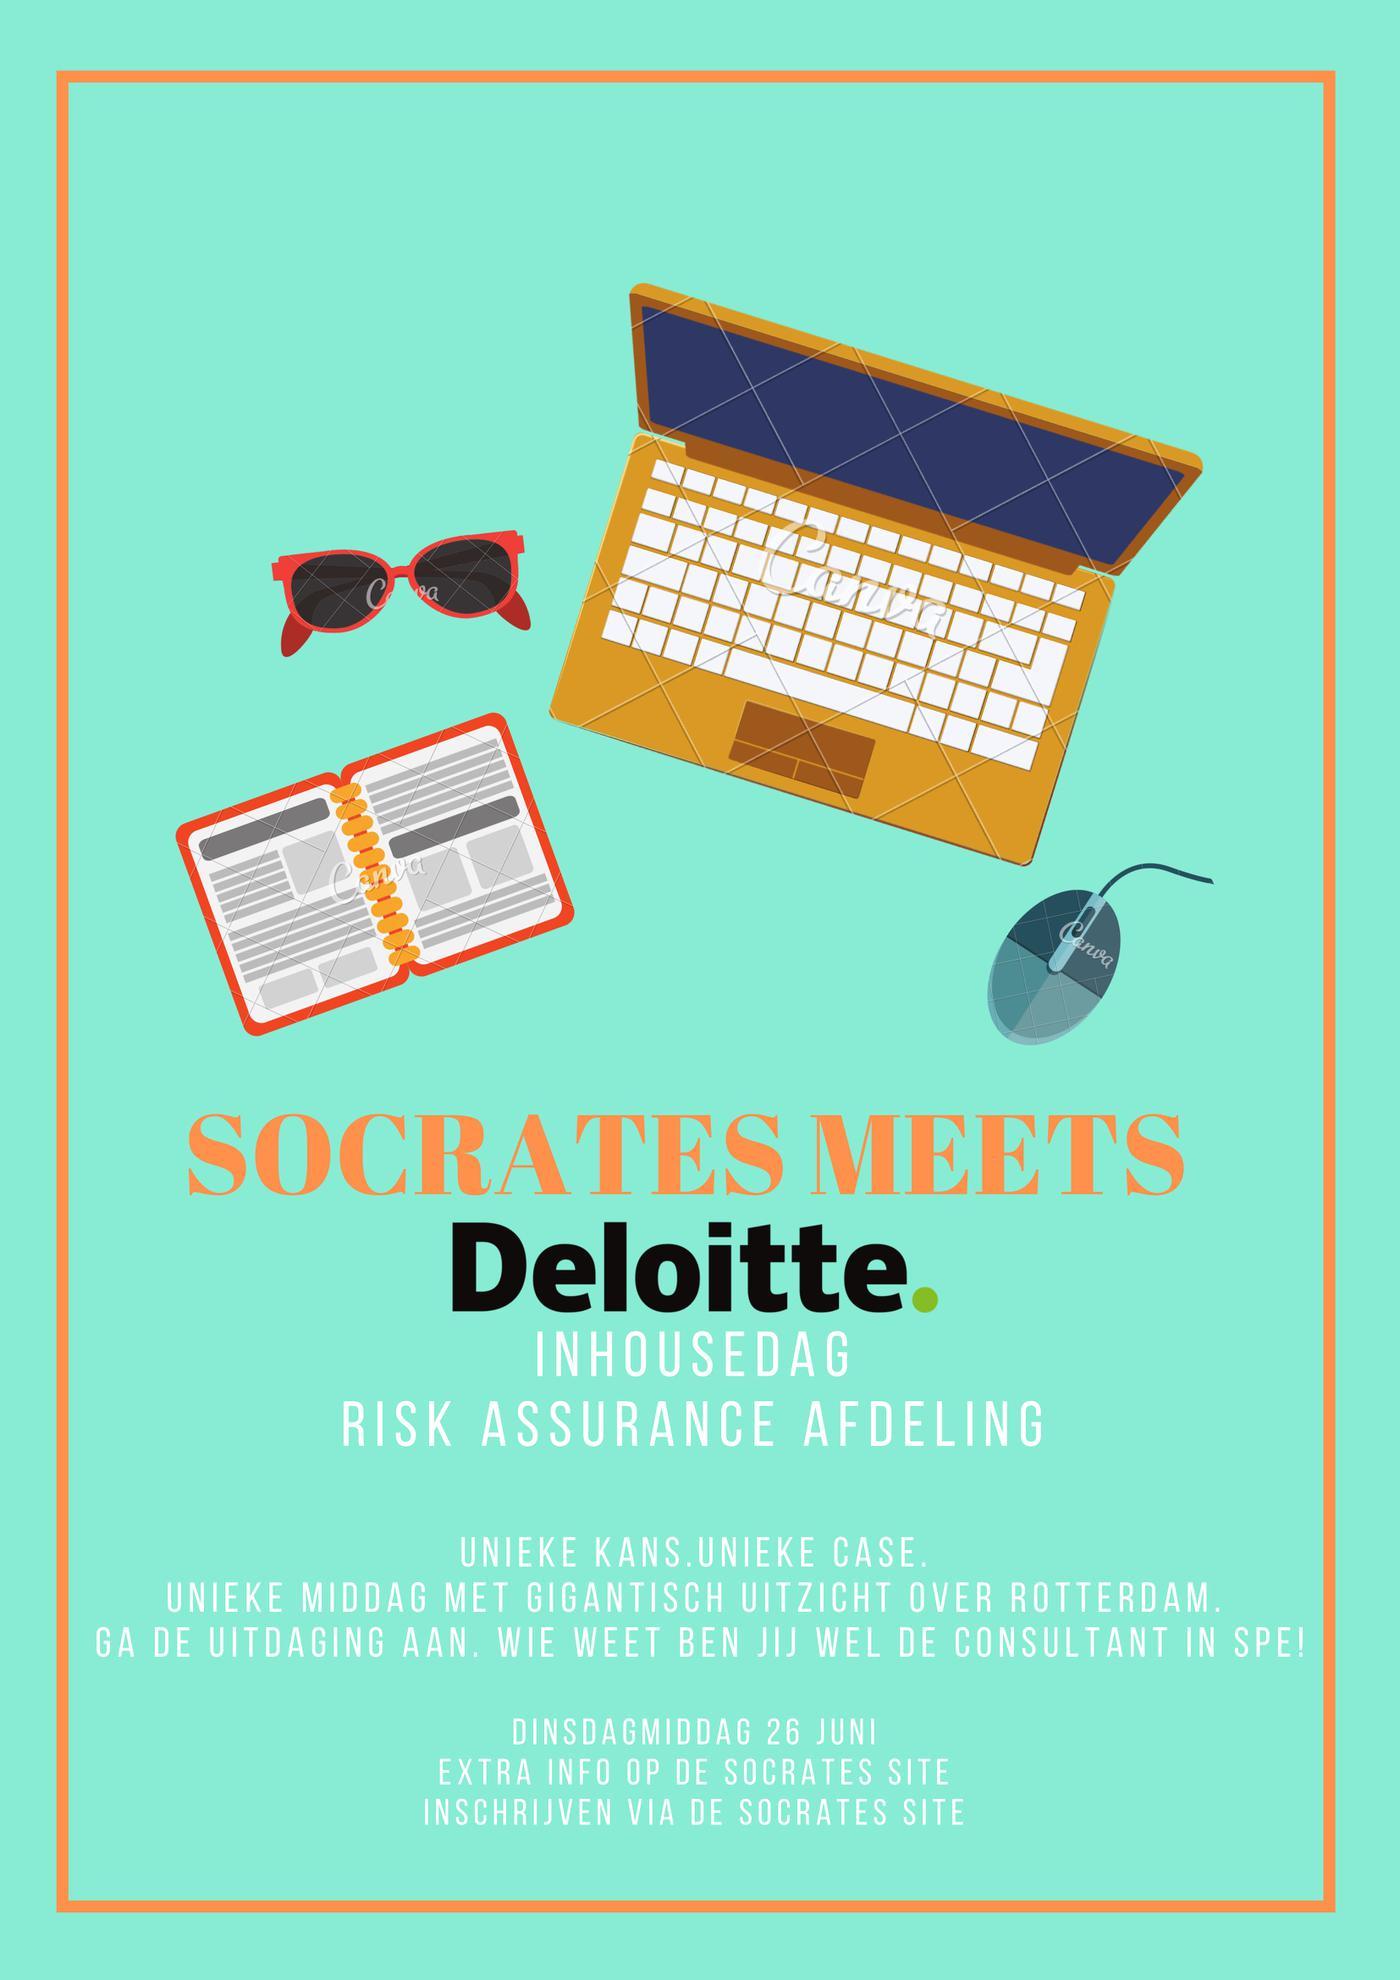 Rotterdam: Inhousedag Deloitte